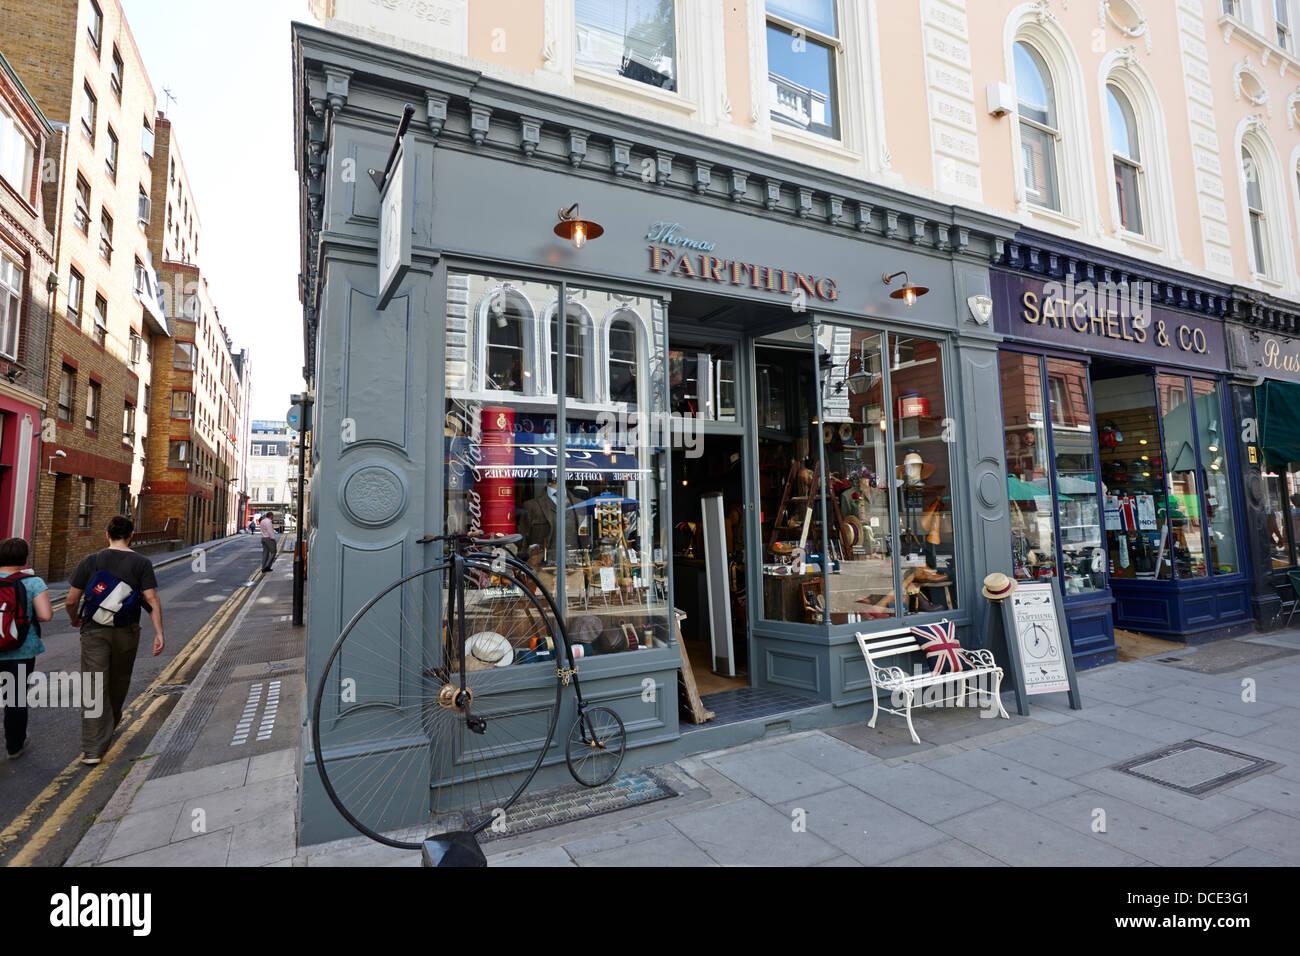 thomas farthing mens clothes store bloomsbury London England UK - Stock Image